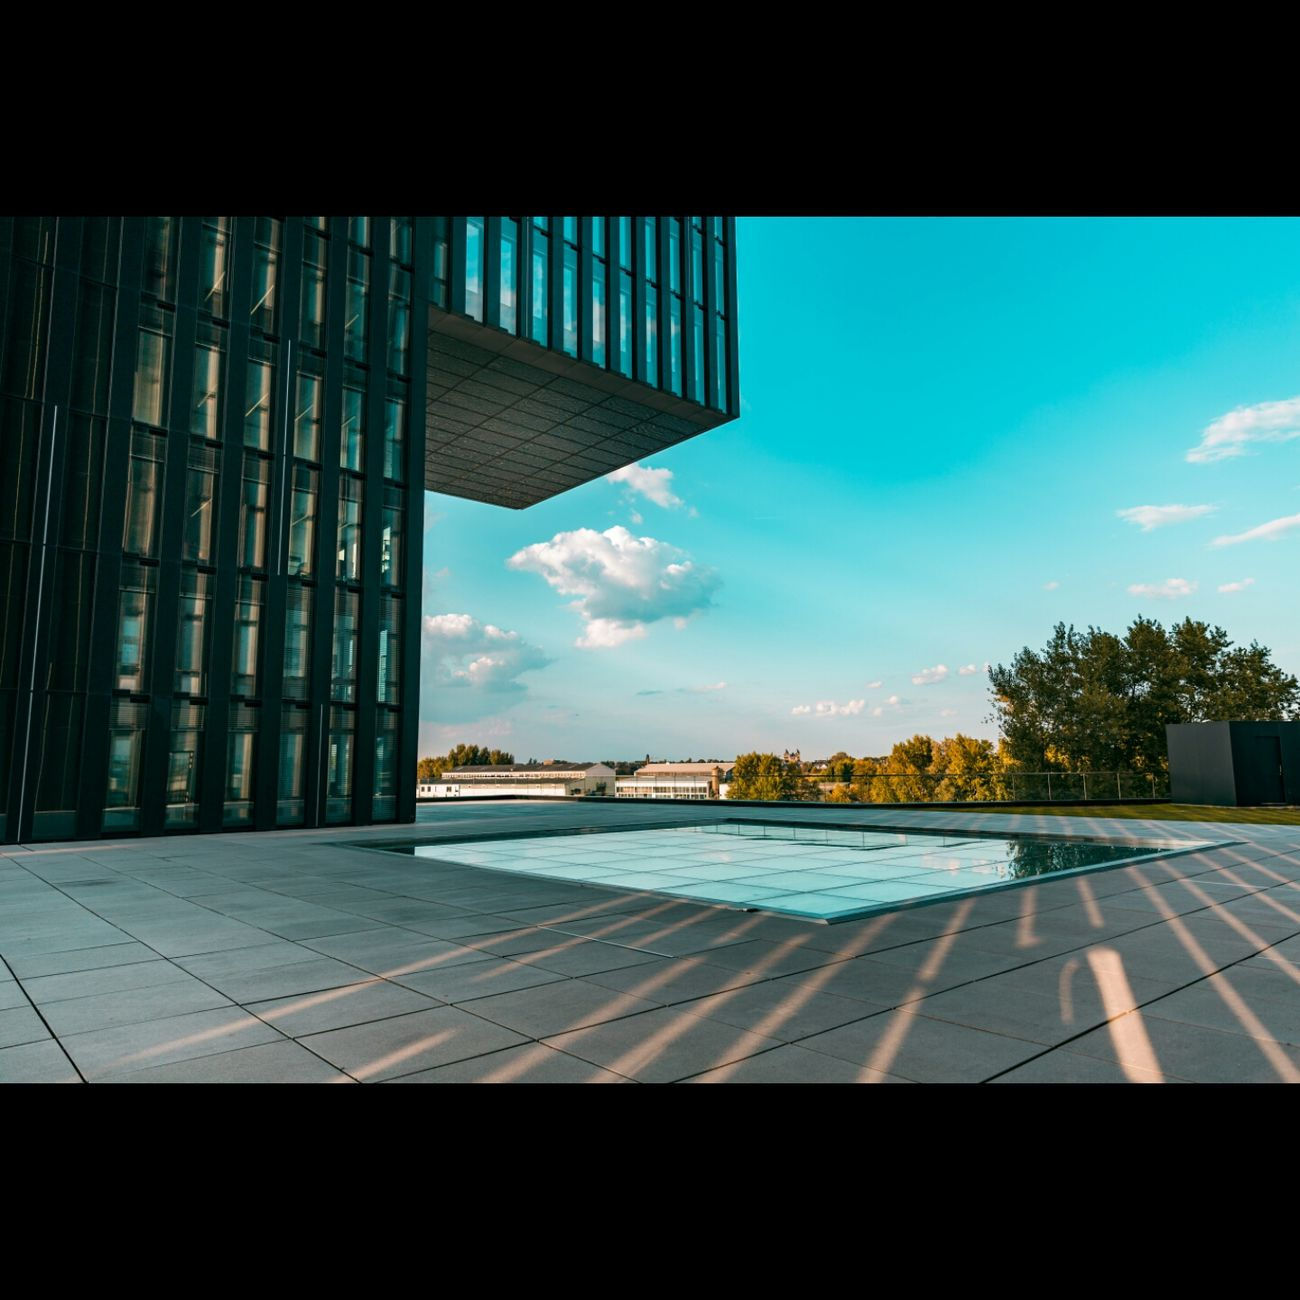 Sky Tiled Floor Flooring Cloud Day Cloud - Sky Blue Tiled Medienhafen Düsseldorf 🌾 Hyattregency Gebäude Gebäude Architektur Düsseldorf Harmony Of Colours Outdoors Modern Architectureporn Rheinriver Rheinturm  TakeoverContrast Office Building No People Tranquility Modern Architecture